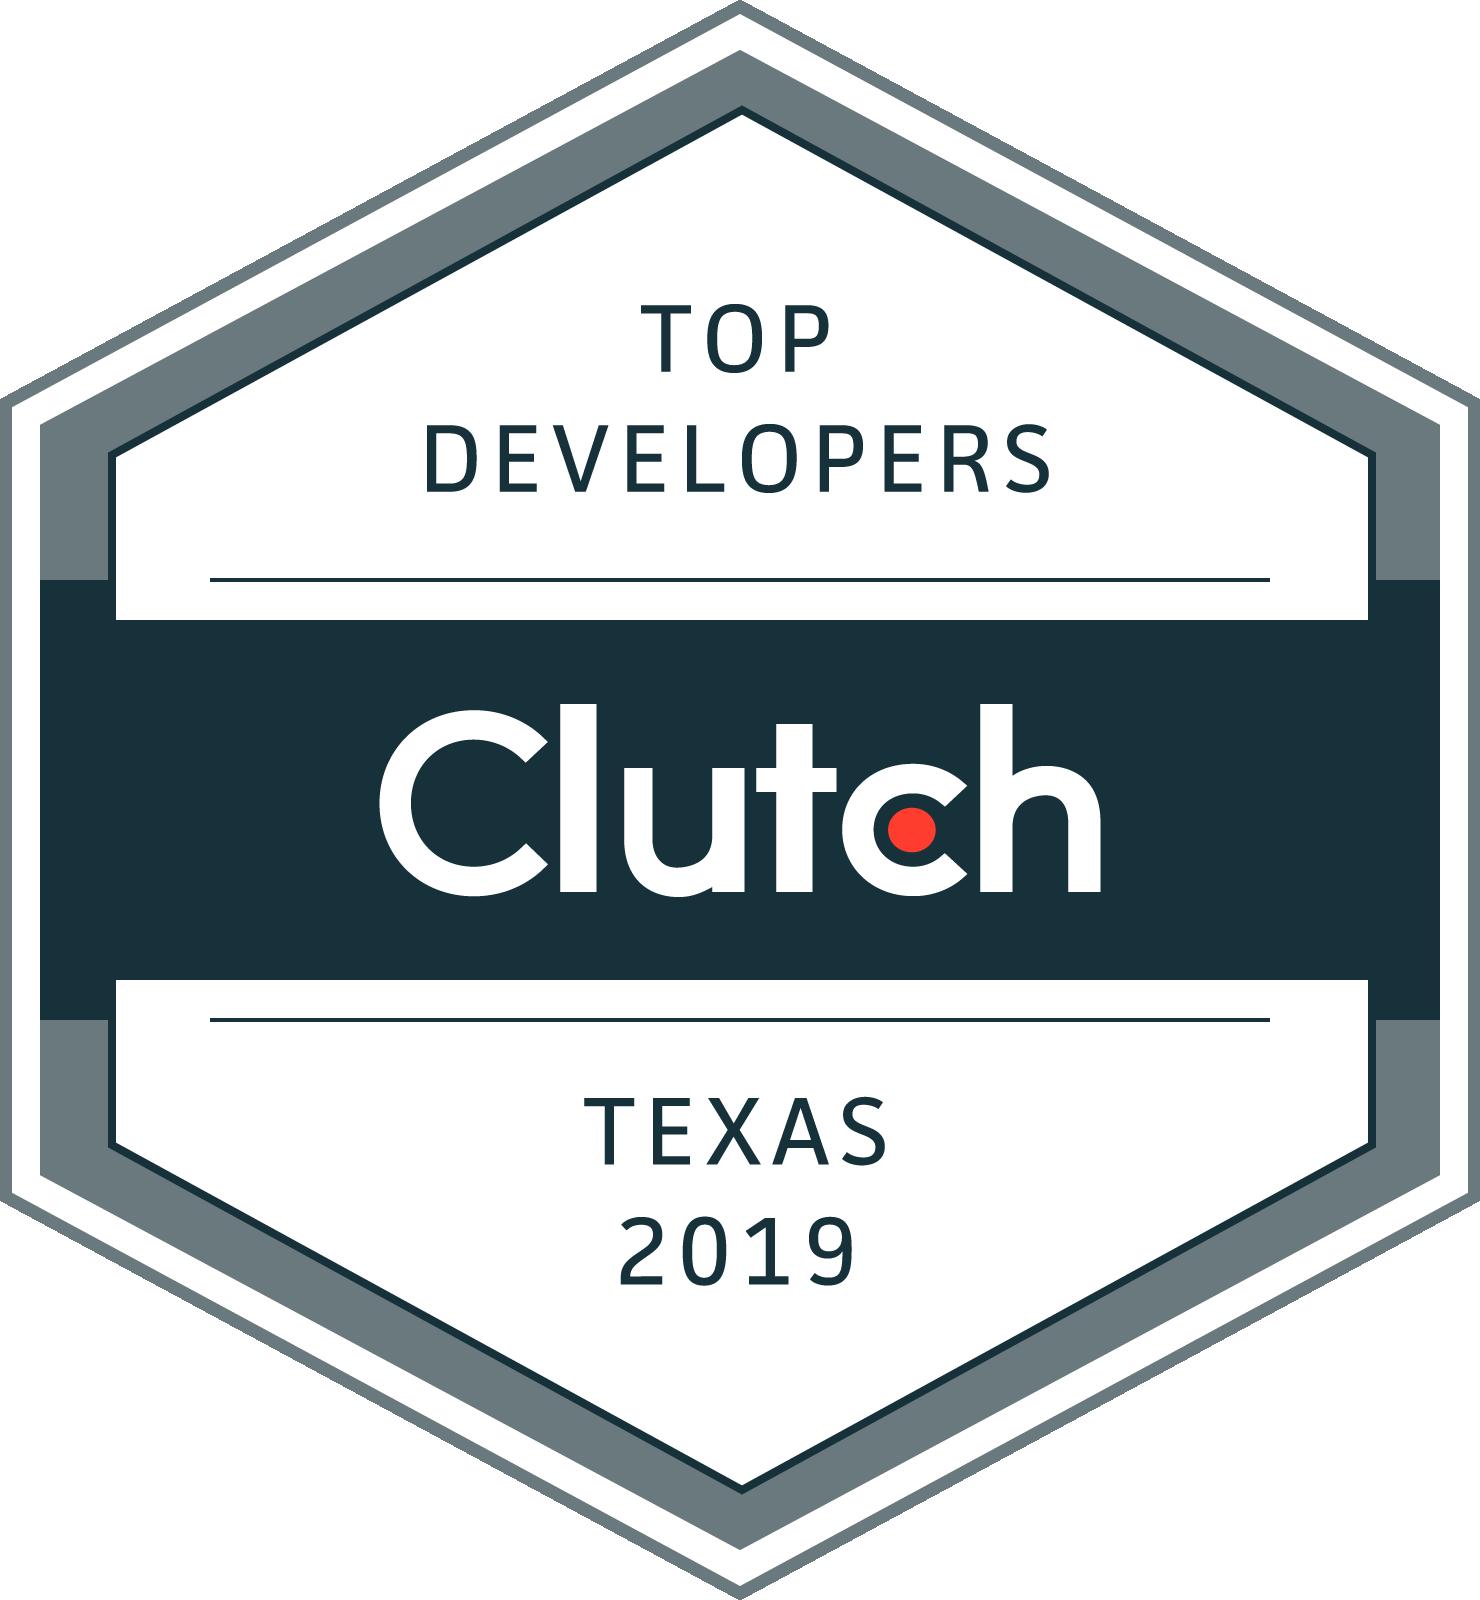 Clutch Names Mutual Mobile as a 2019 Top Developer in Texas